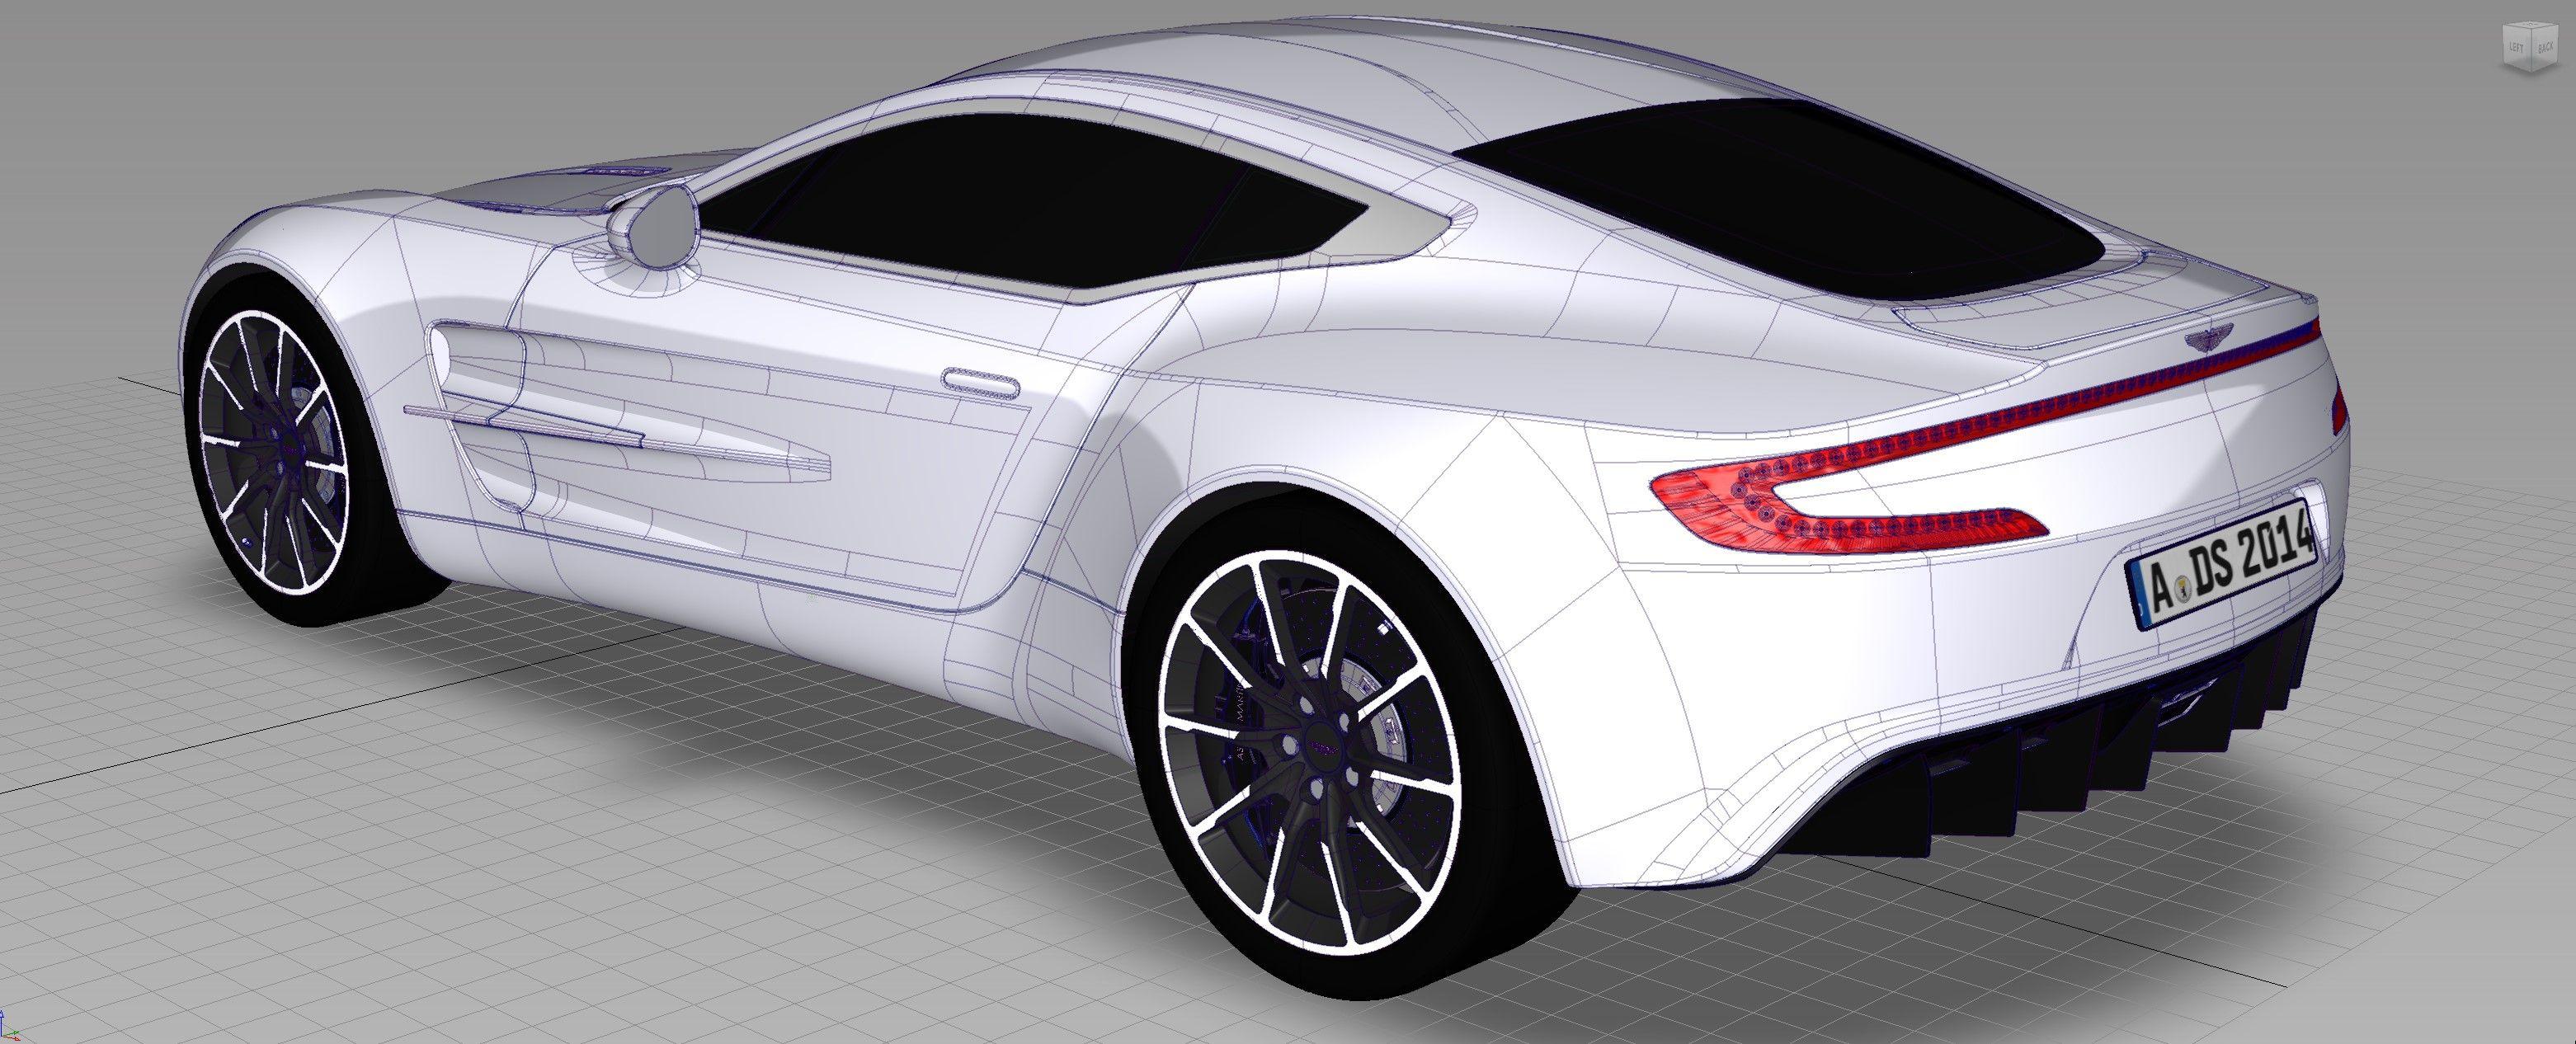 Latest Autodesk Alias model! Aston Martin One 77. Quick renders in VRED - Album on Imgur